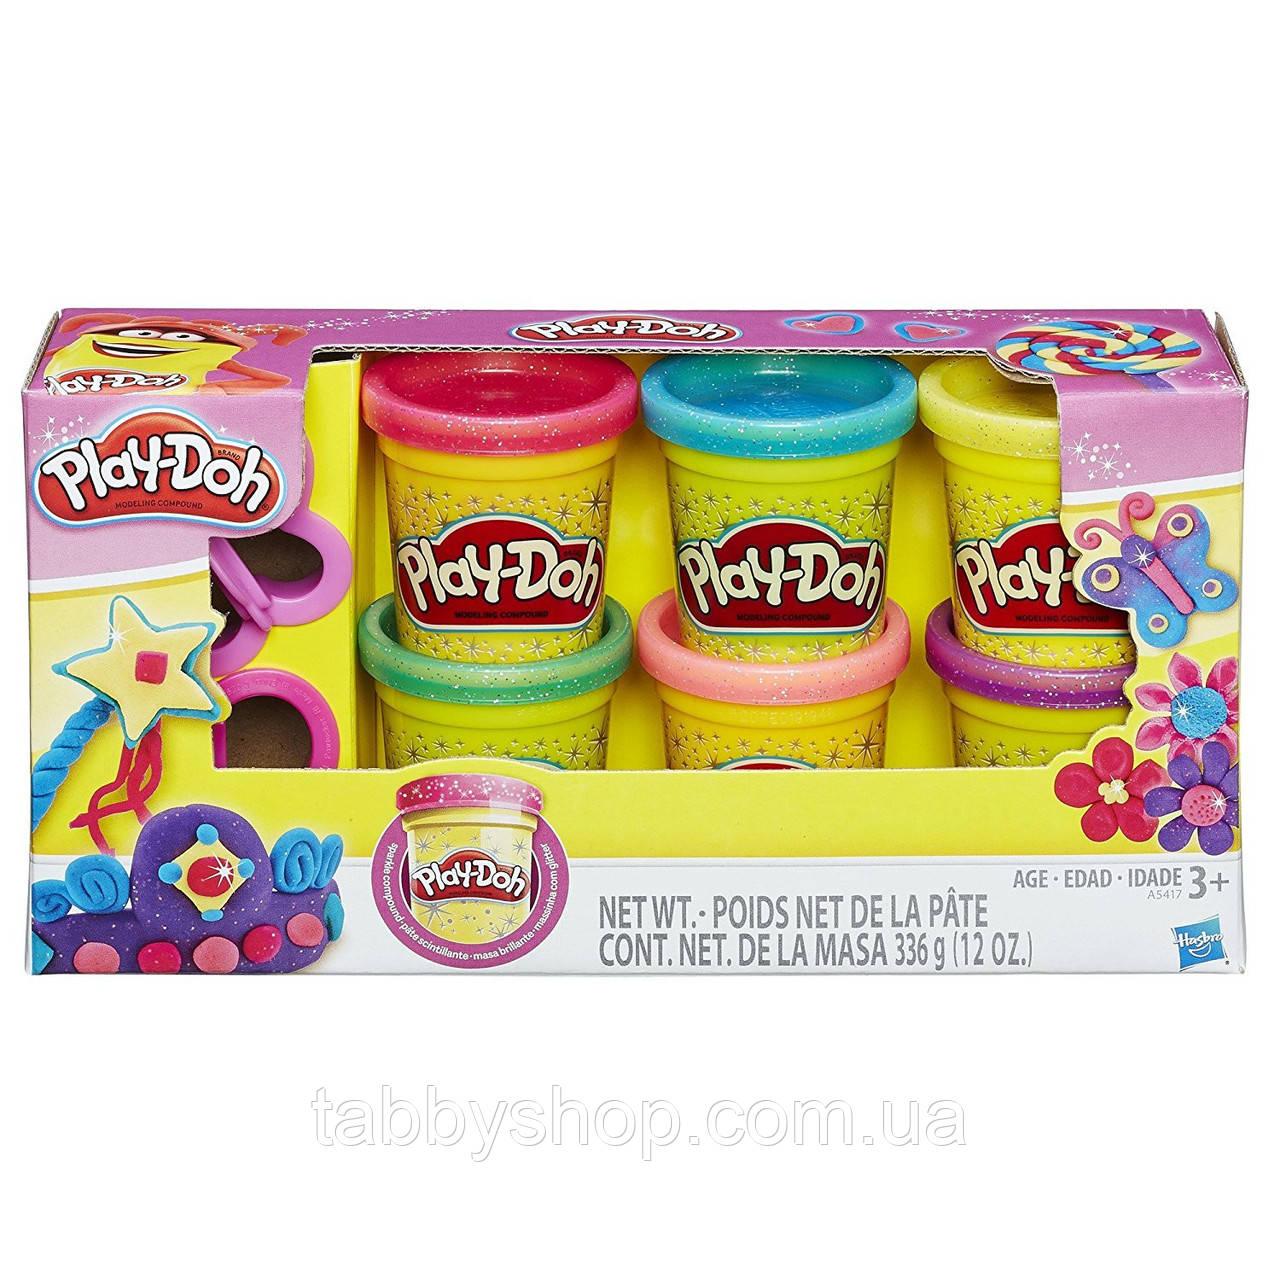 Набор пластилина 6 баночек с блёстками HASBRO Play Doh